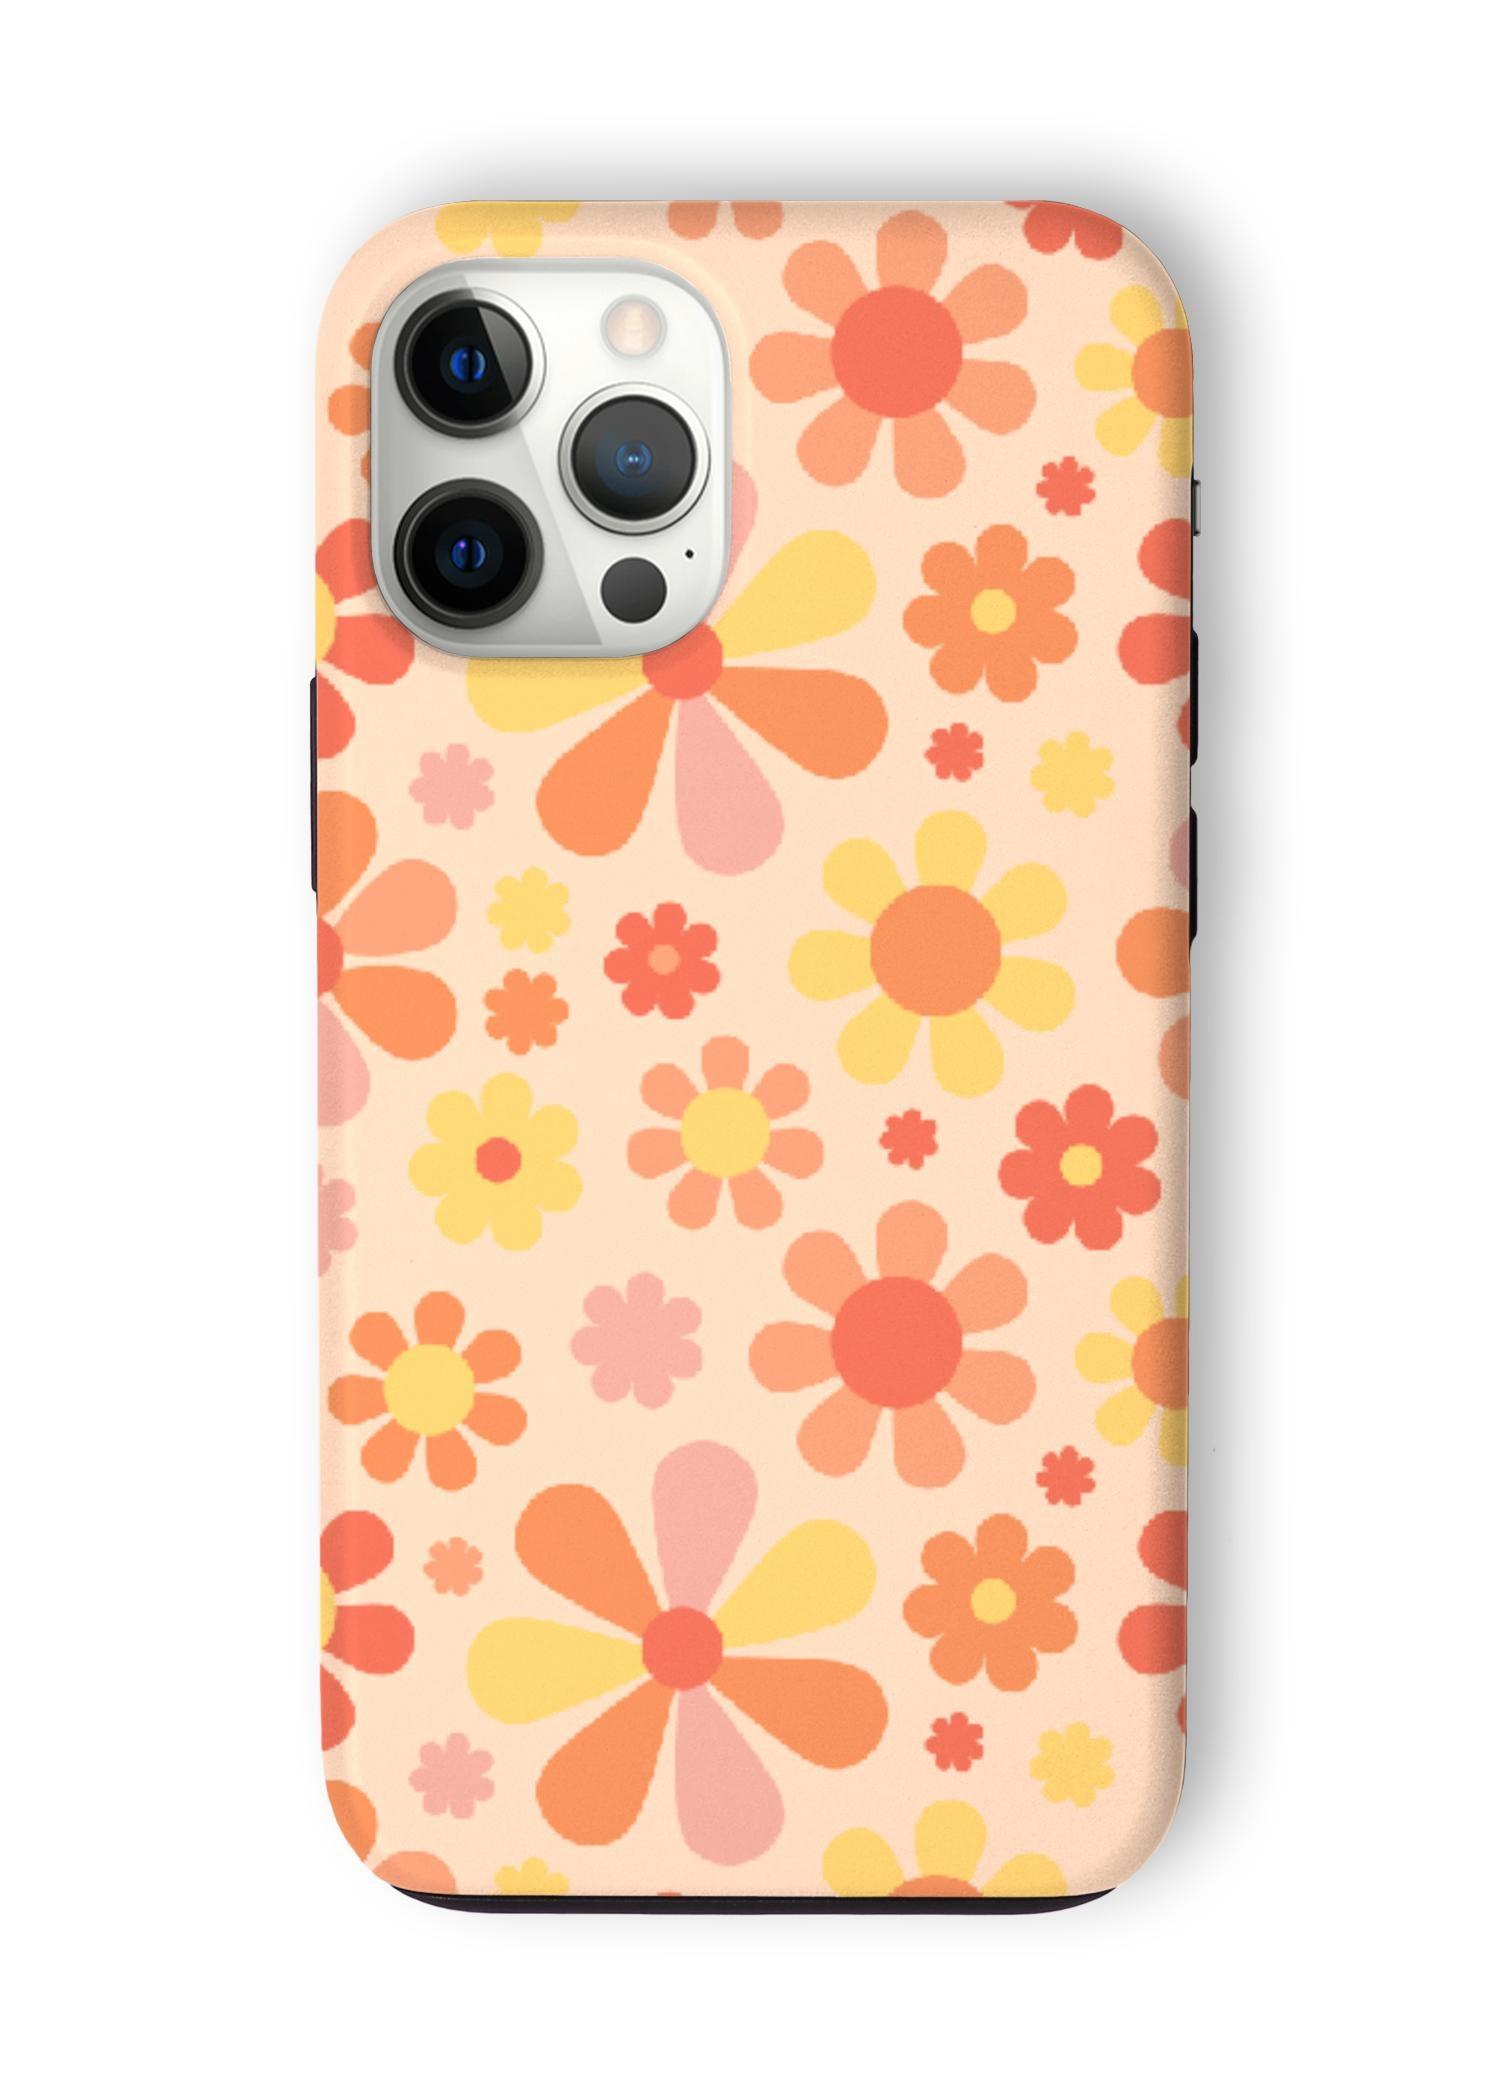 VIDA iPhone Case - Sunny Garden by VIDA Original Artist  - Size: iPhone 12 Pro Max / Tough